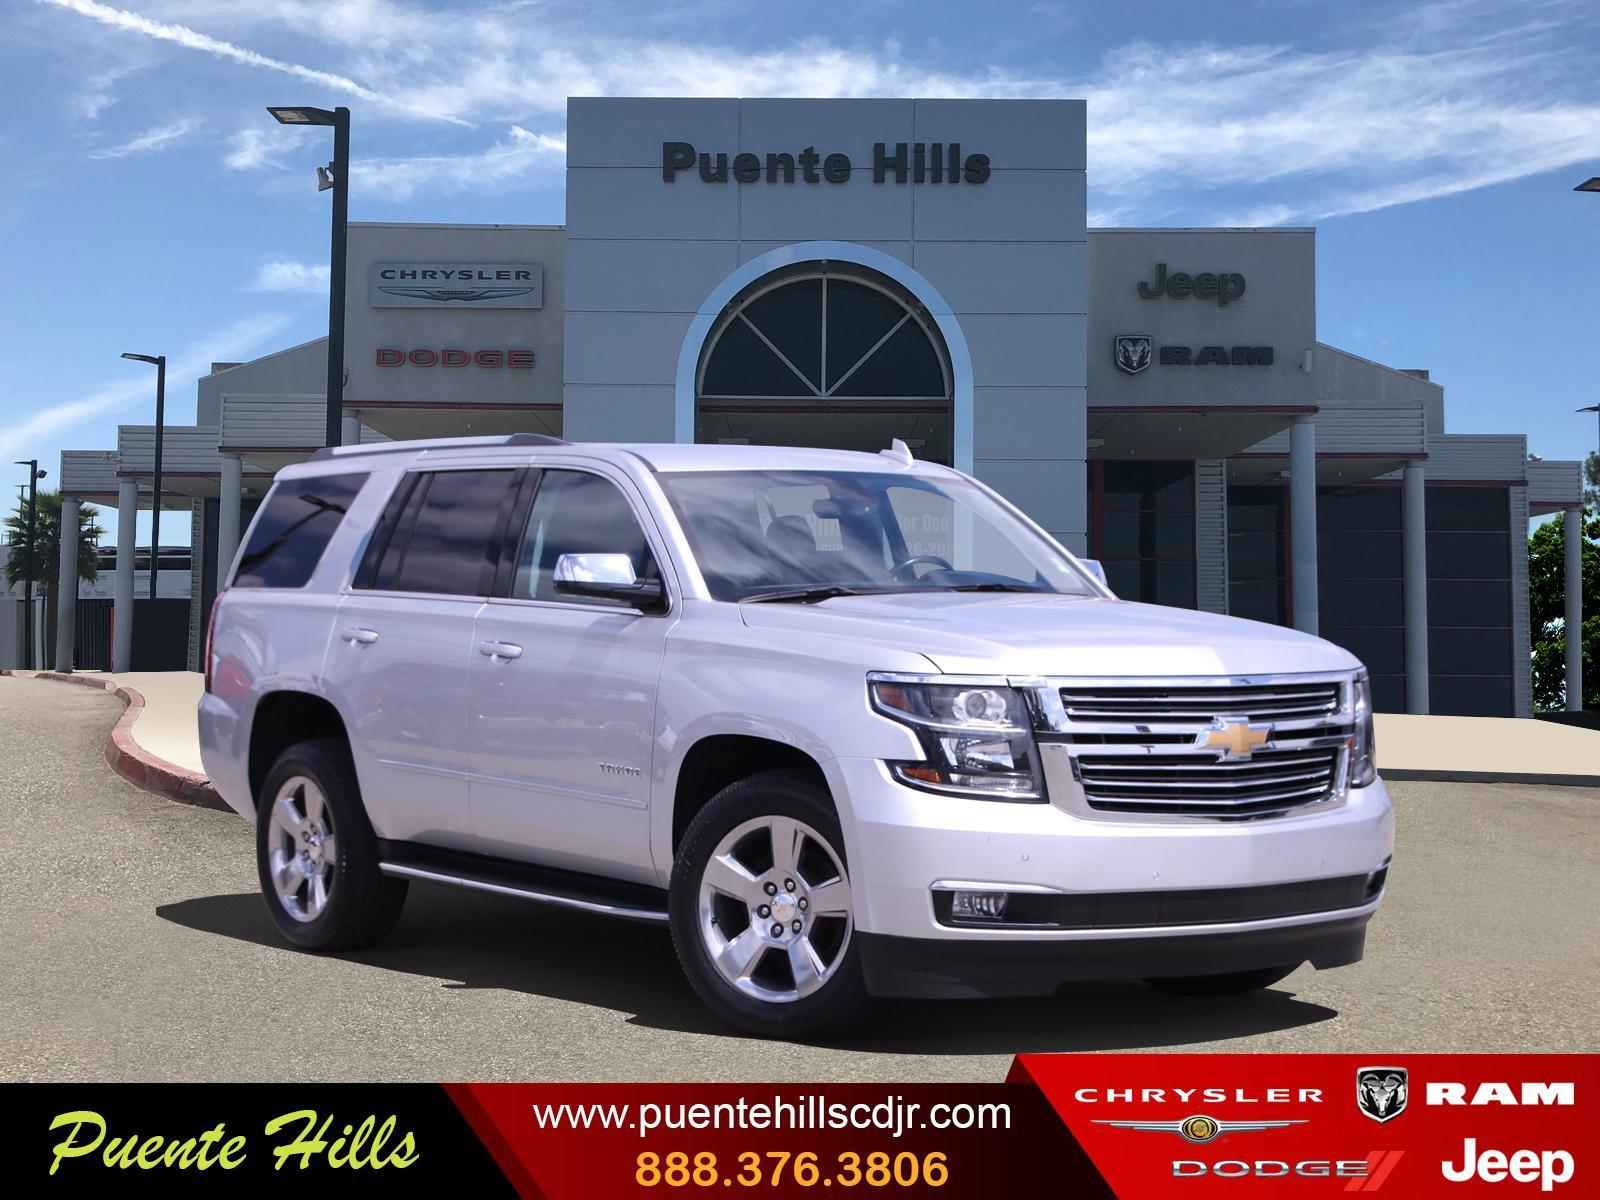 2020 Chevrolet Tahoe Premier 2WD 4dr Premier Gas/Ethanol V8 5.3L/325 [1]